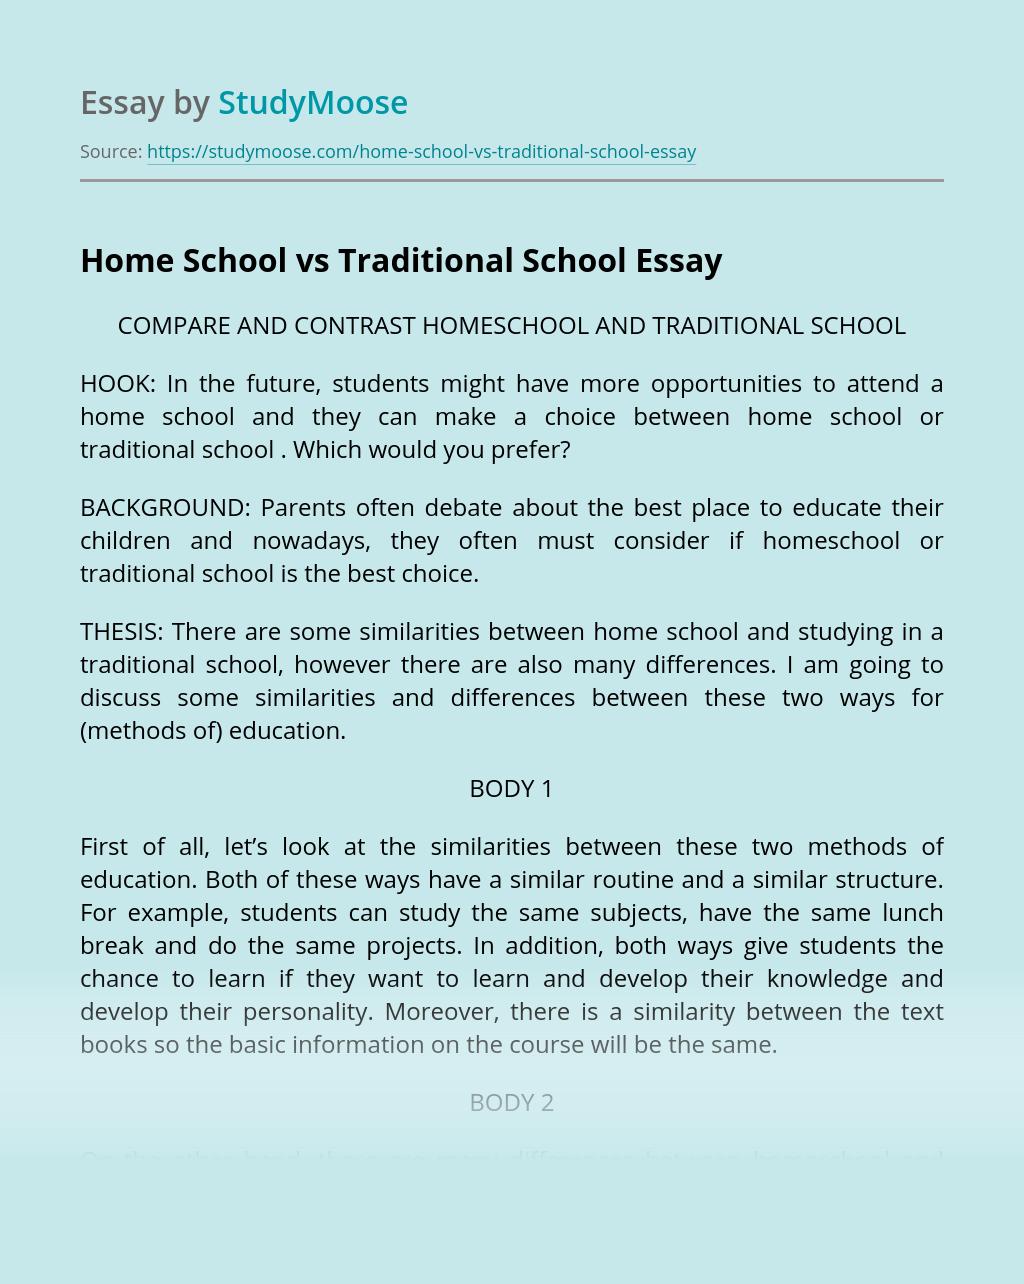 Home School vs Traditional School